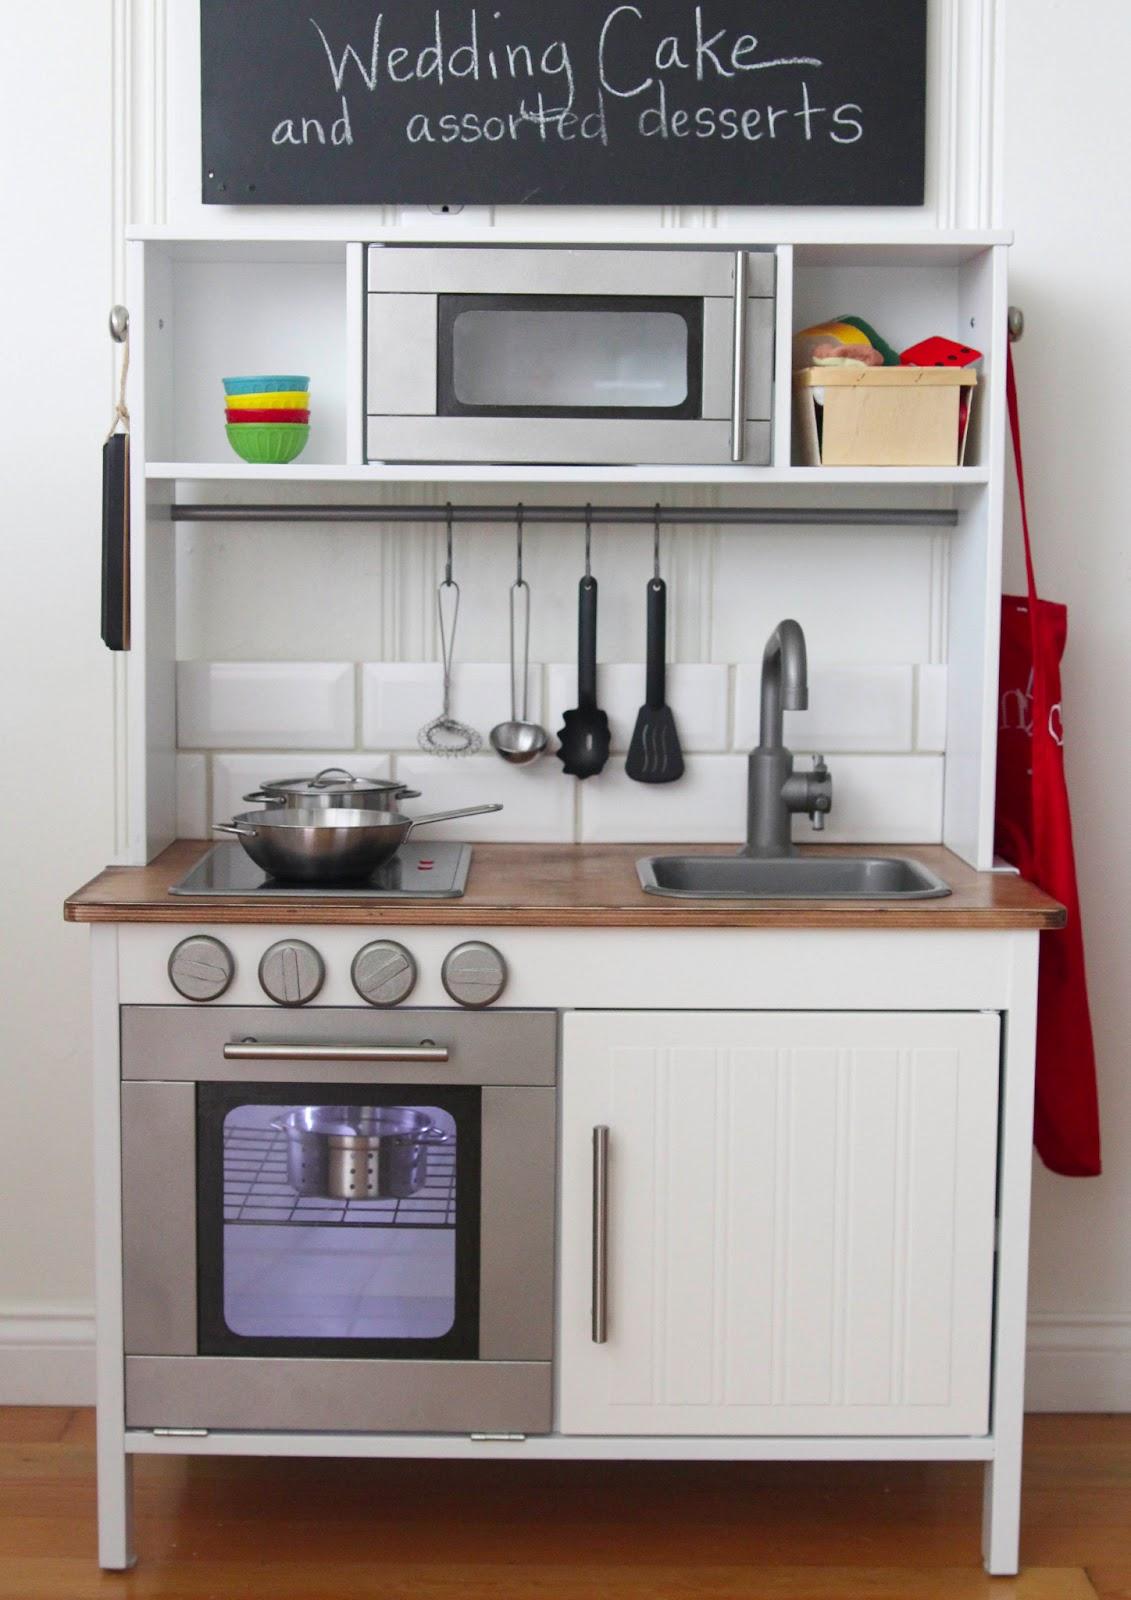 sandpaper and silly putty: kiddo kitchen remodel